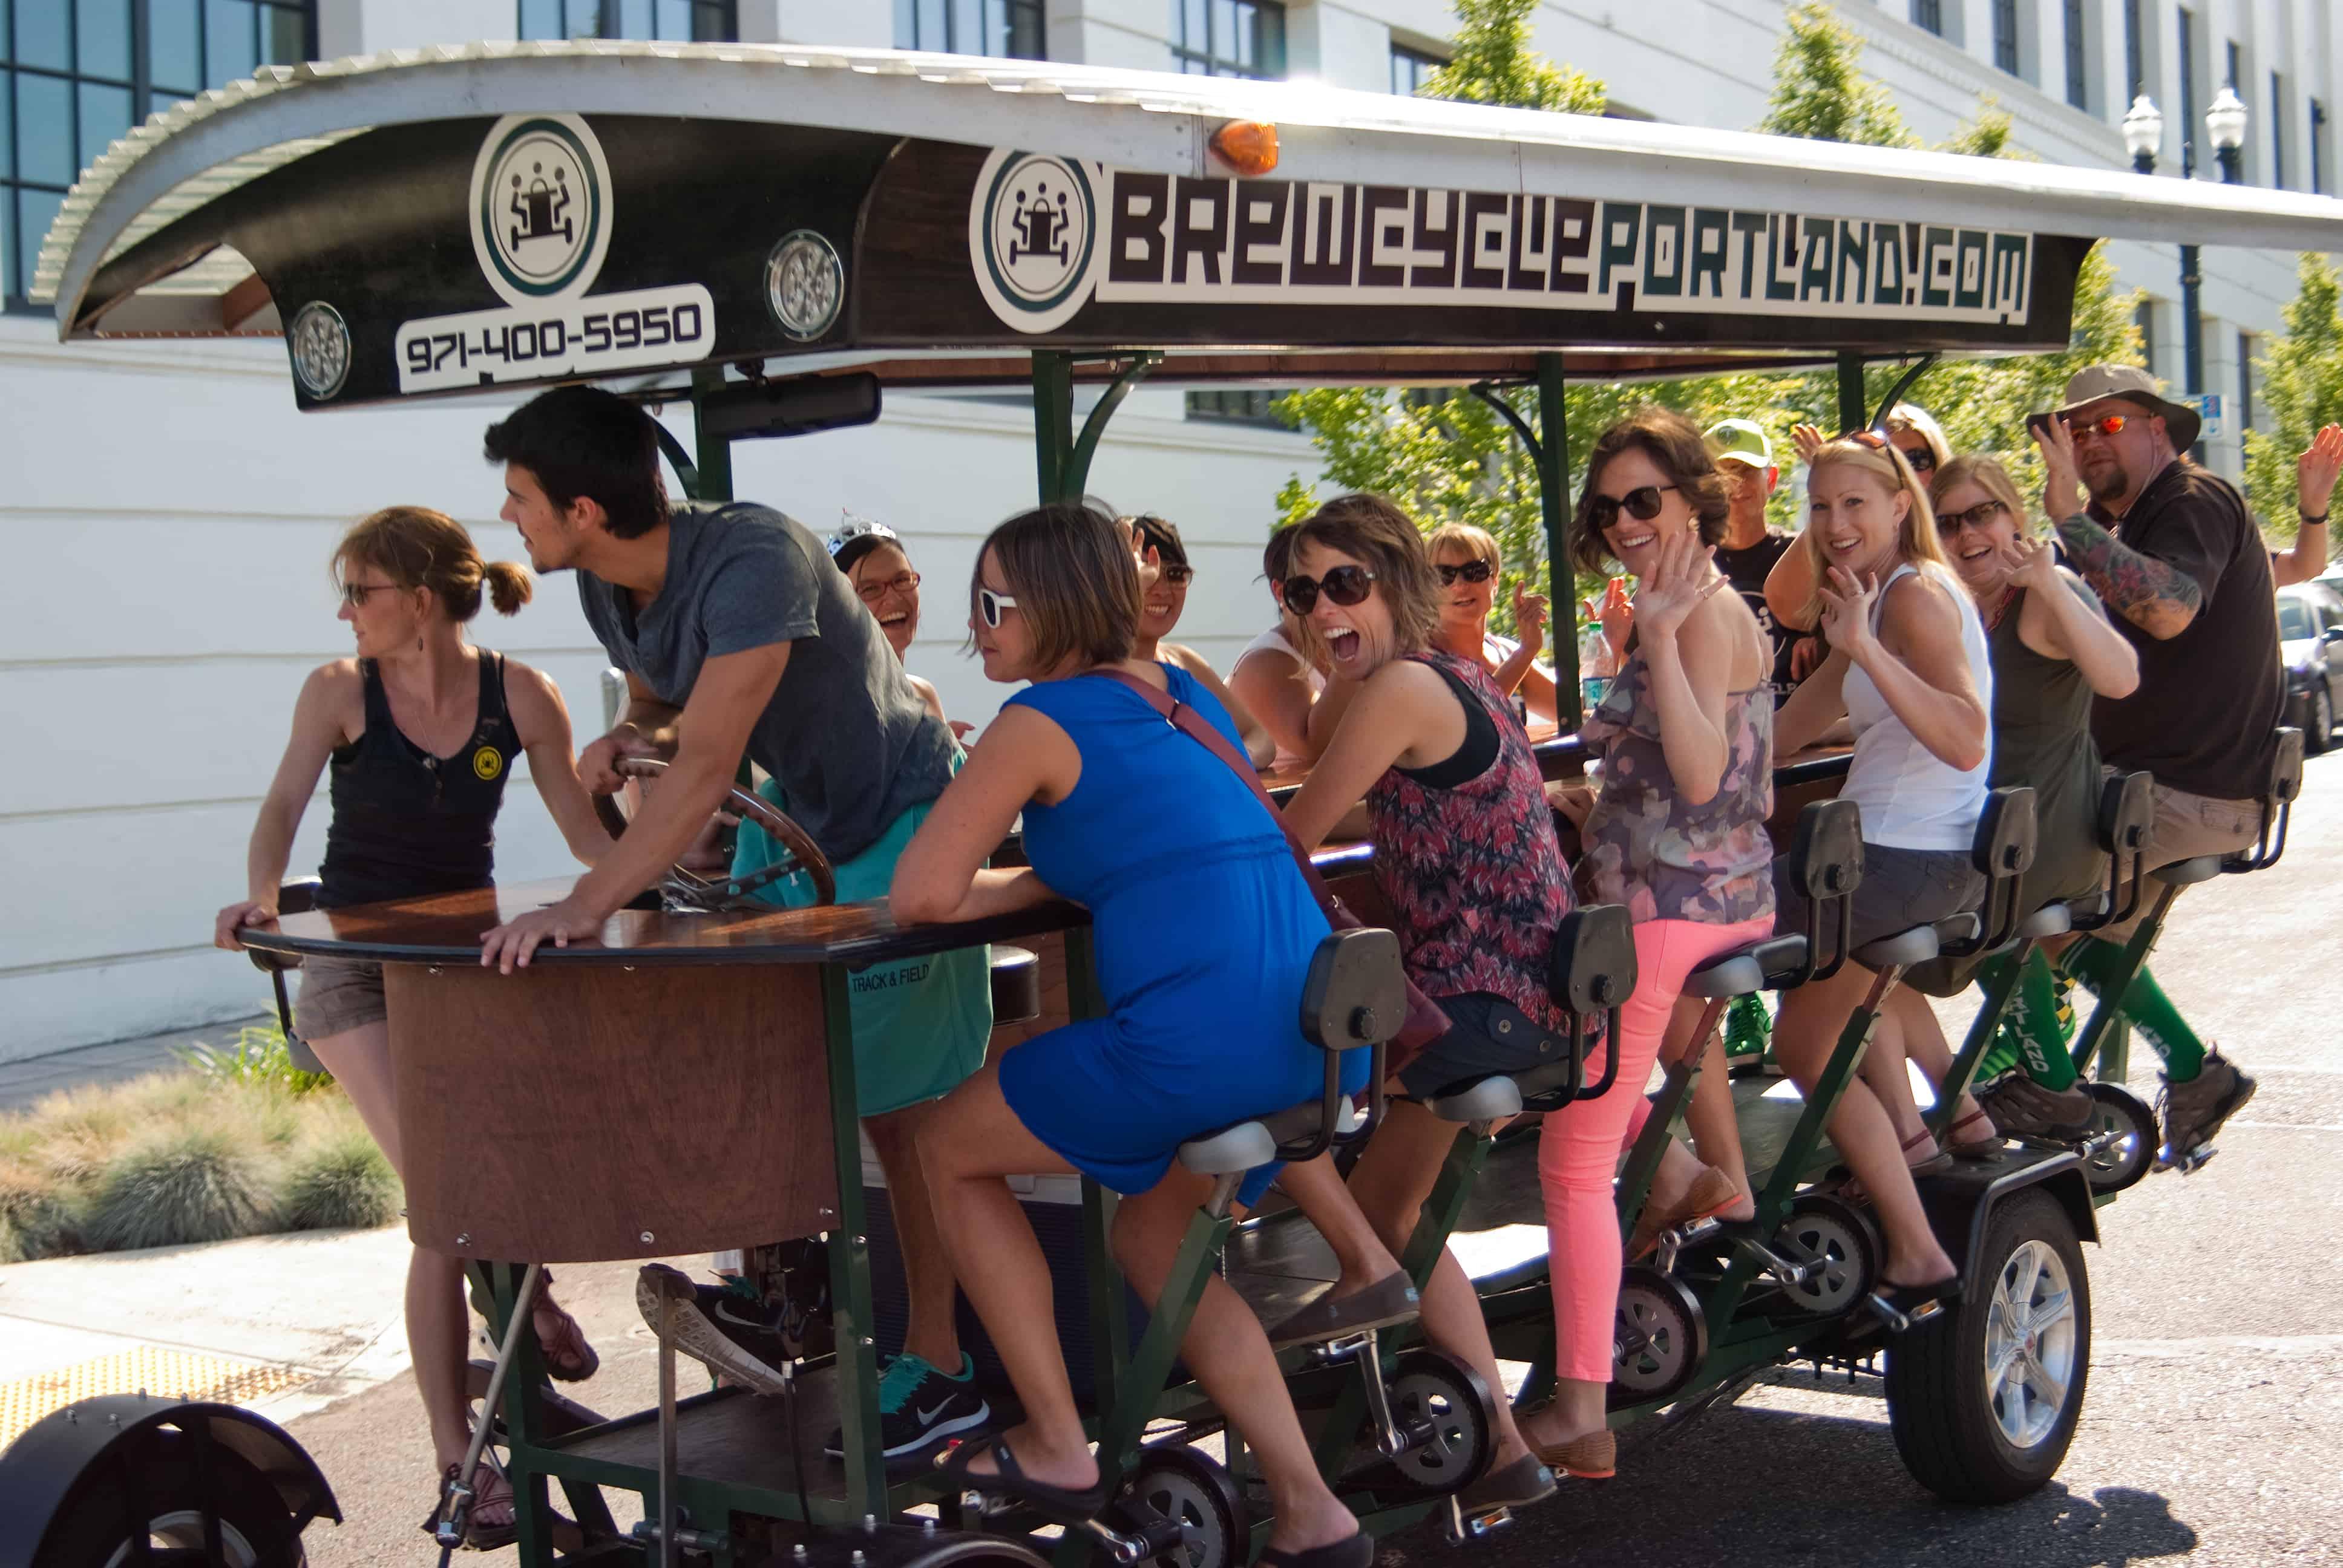 brewcycle portland